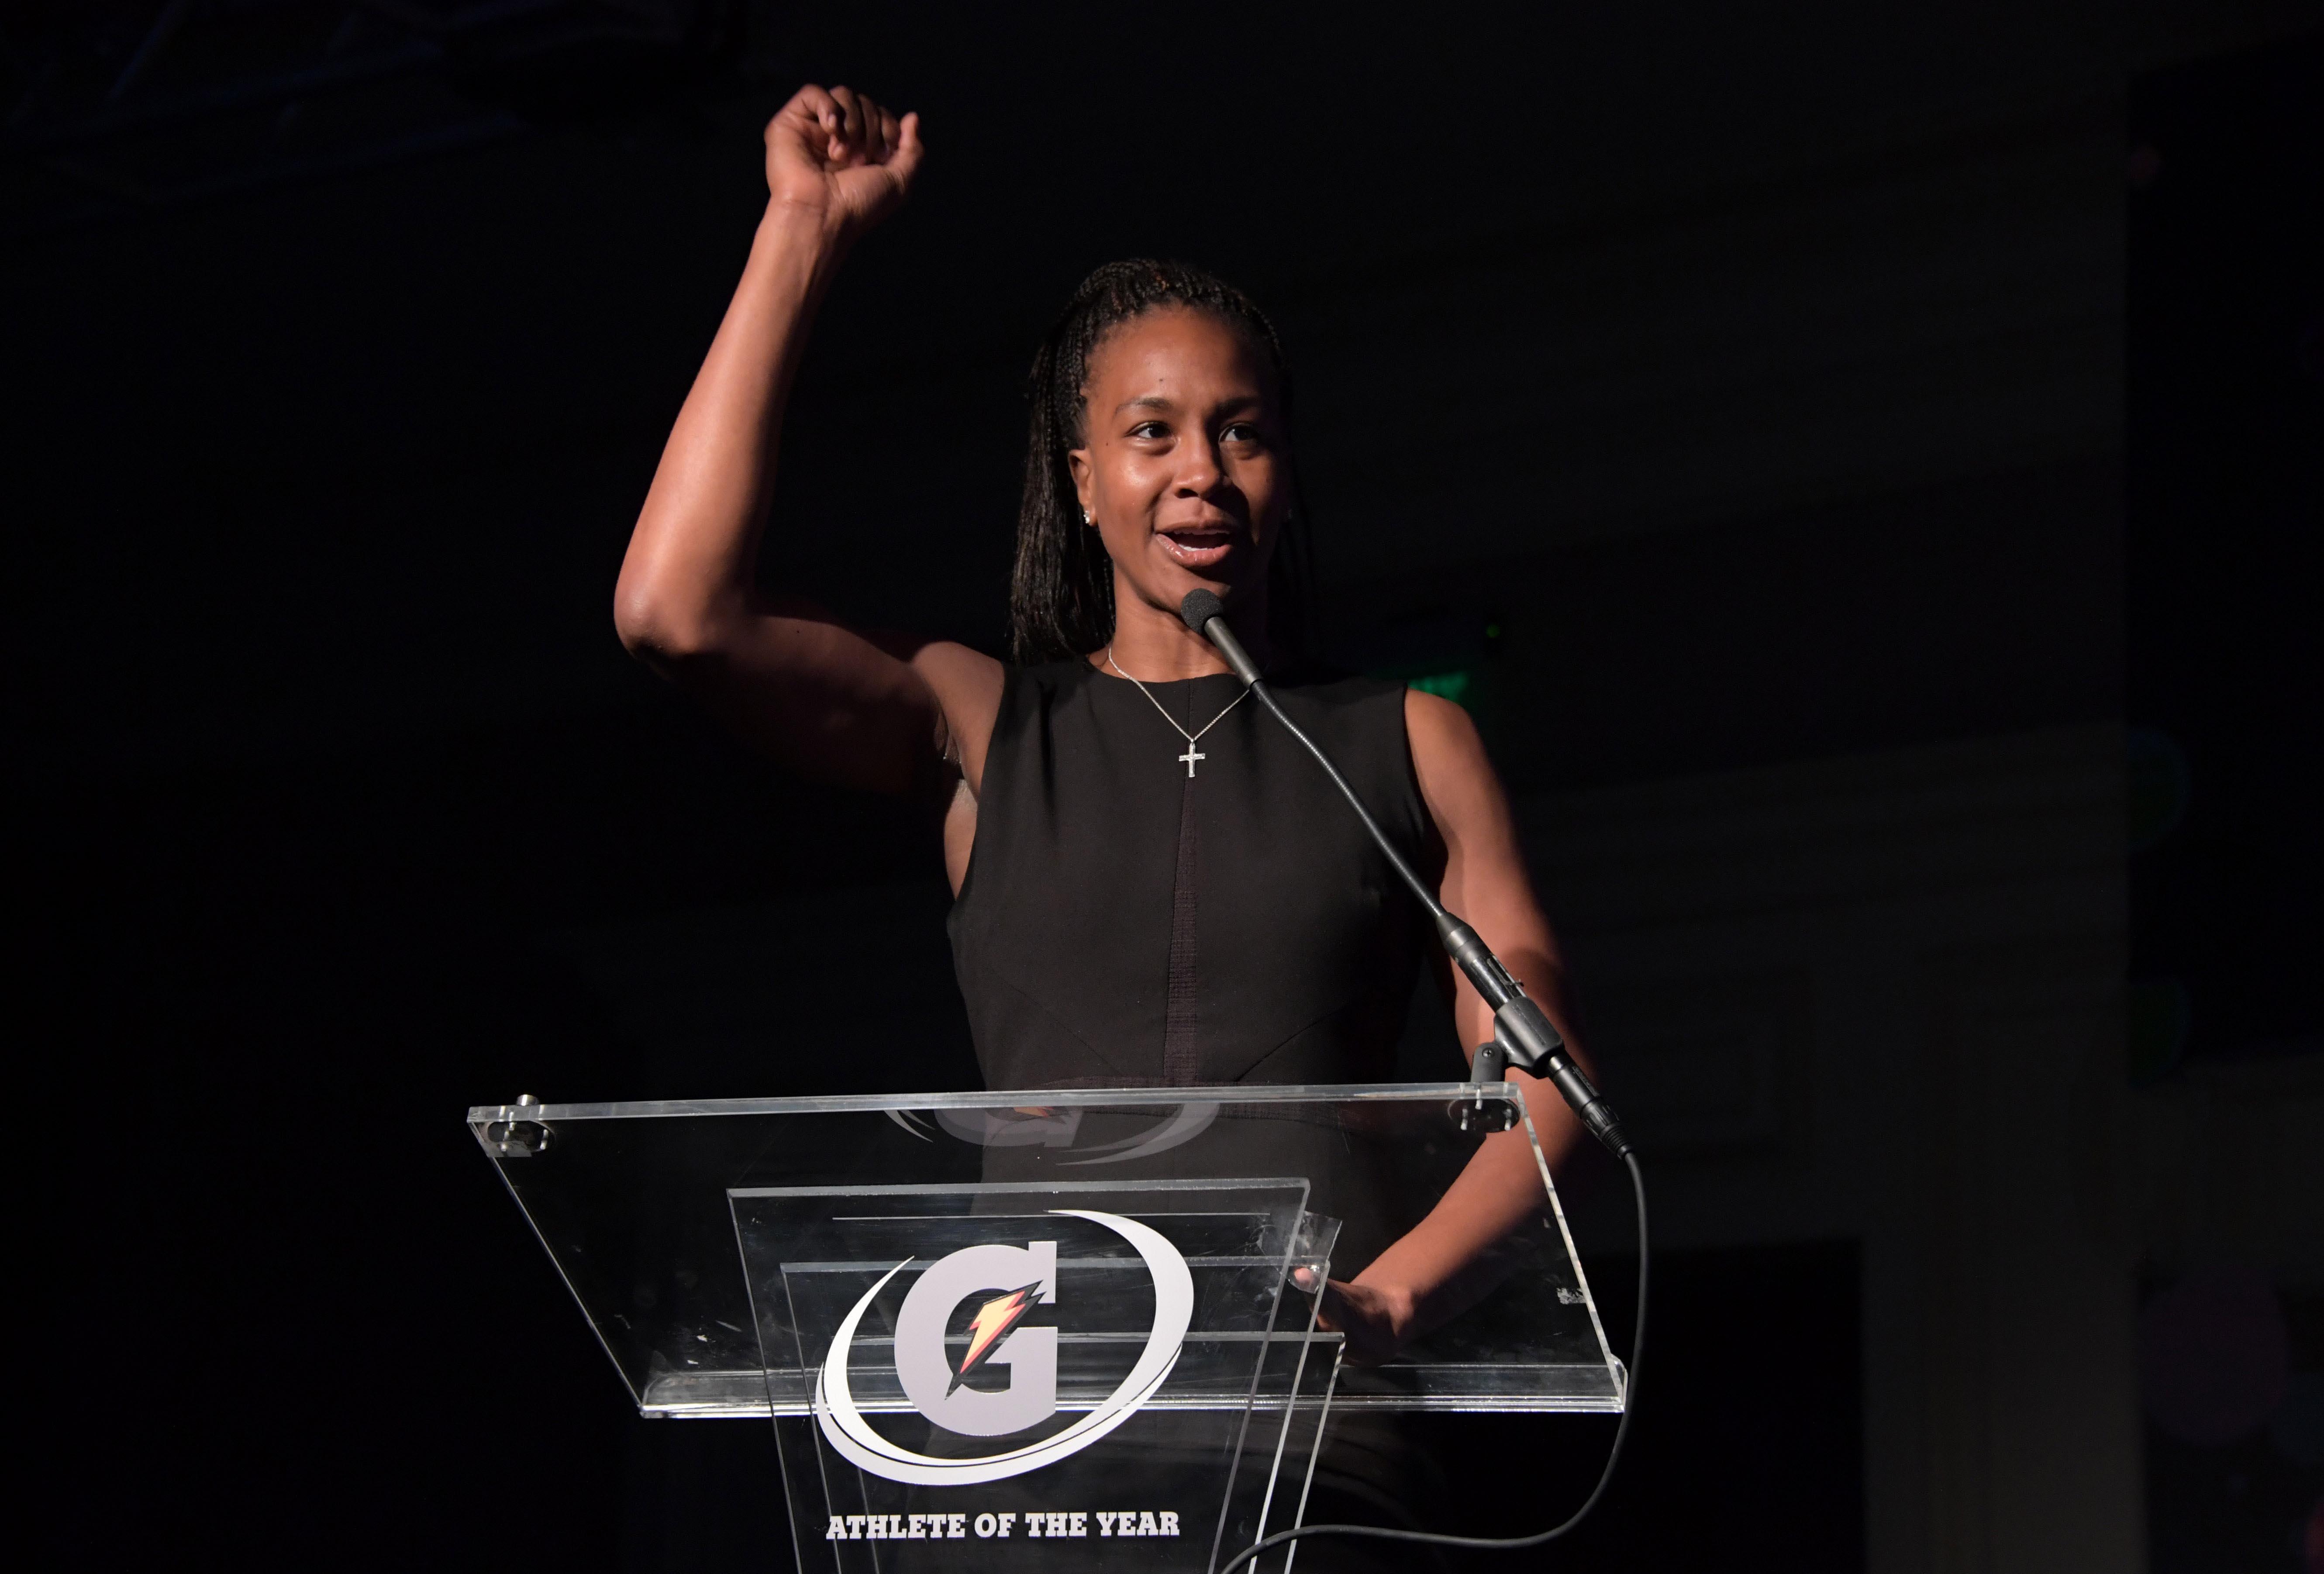 News: Gatorade National Athlete of the Year Awards